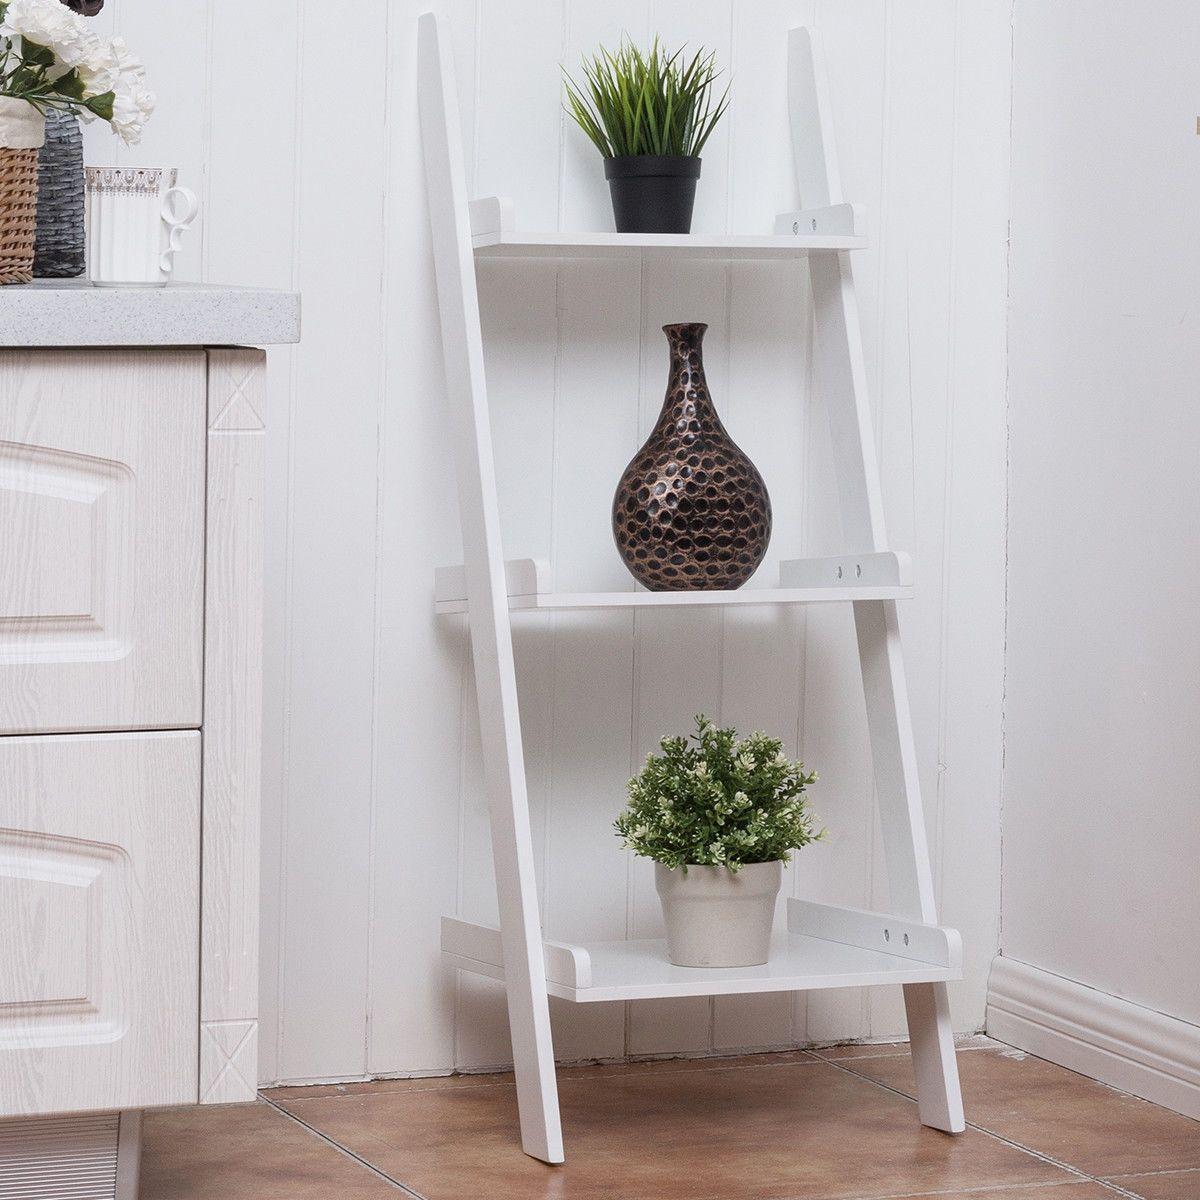 3 Tier Leaning Wall Ladder Display Storage Rack White Bookshelf Bookcase Shelves